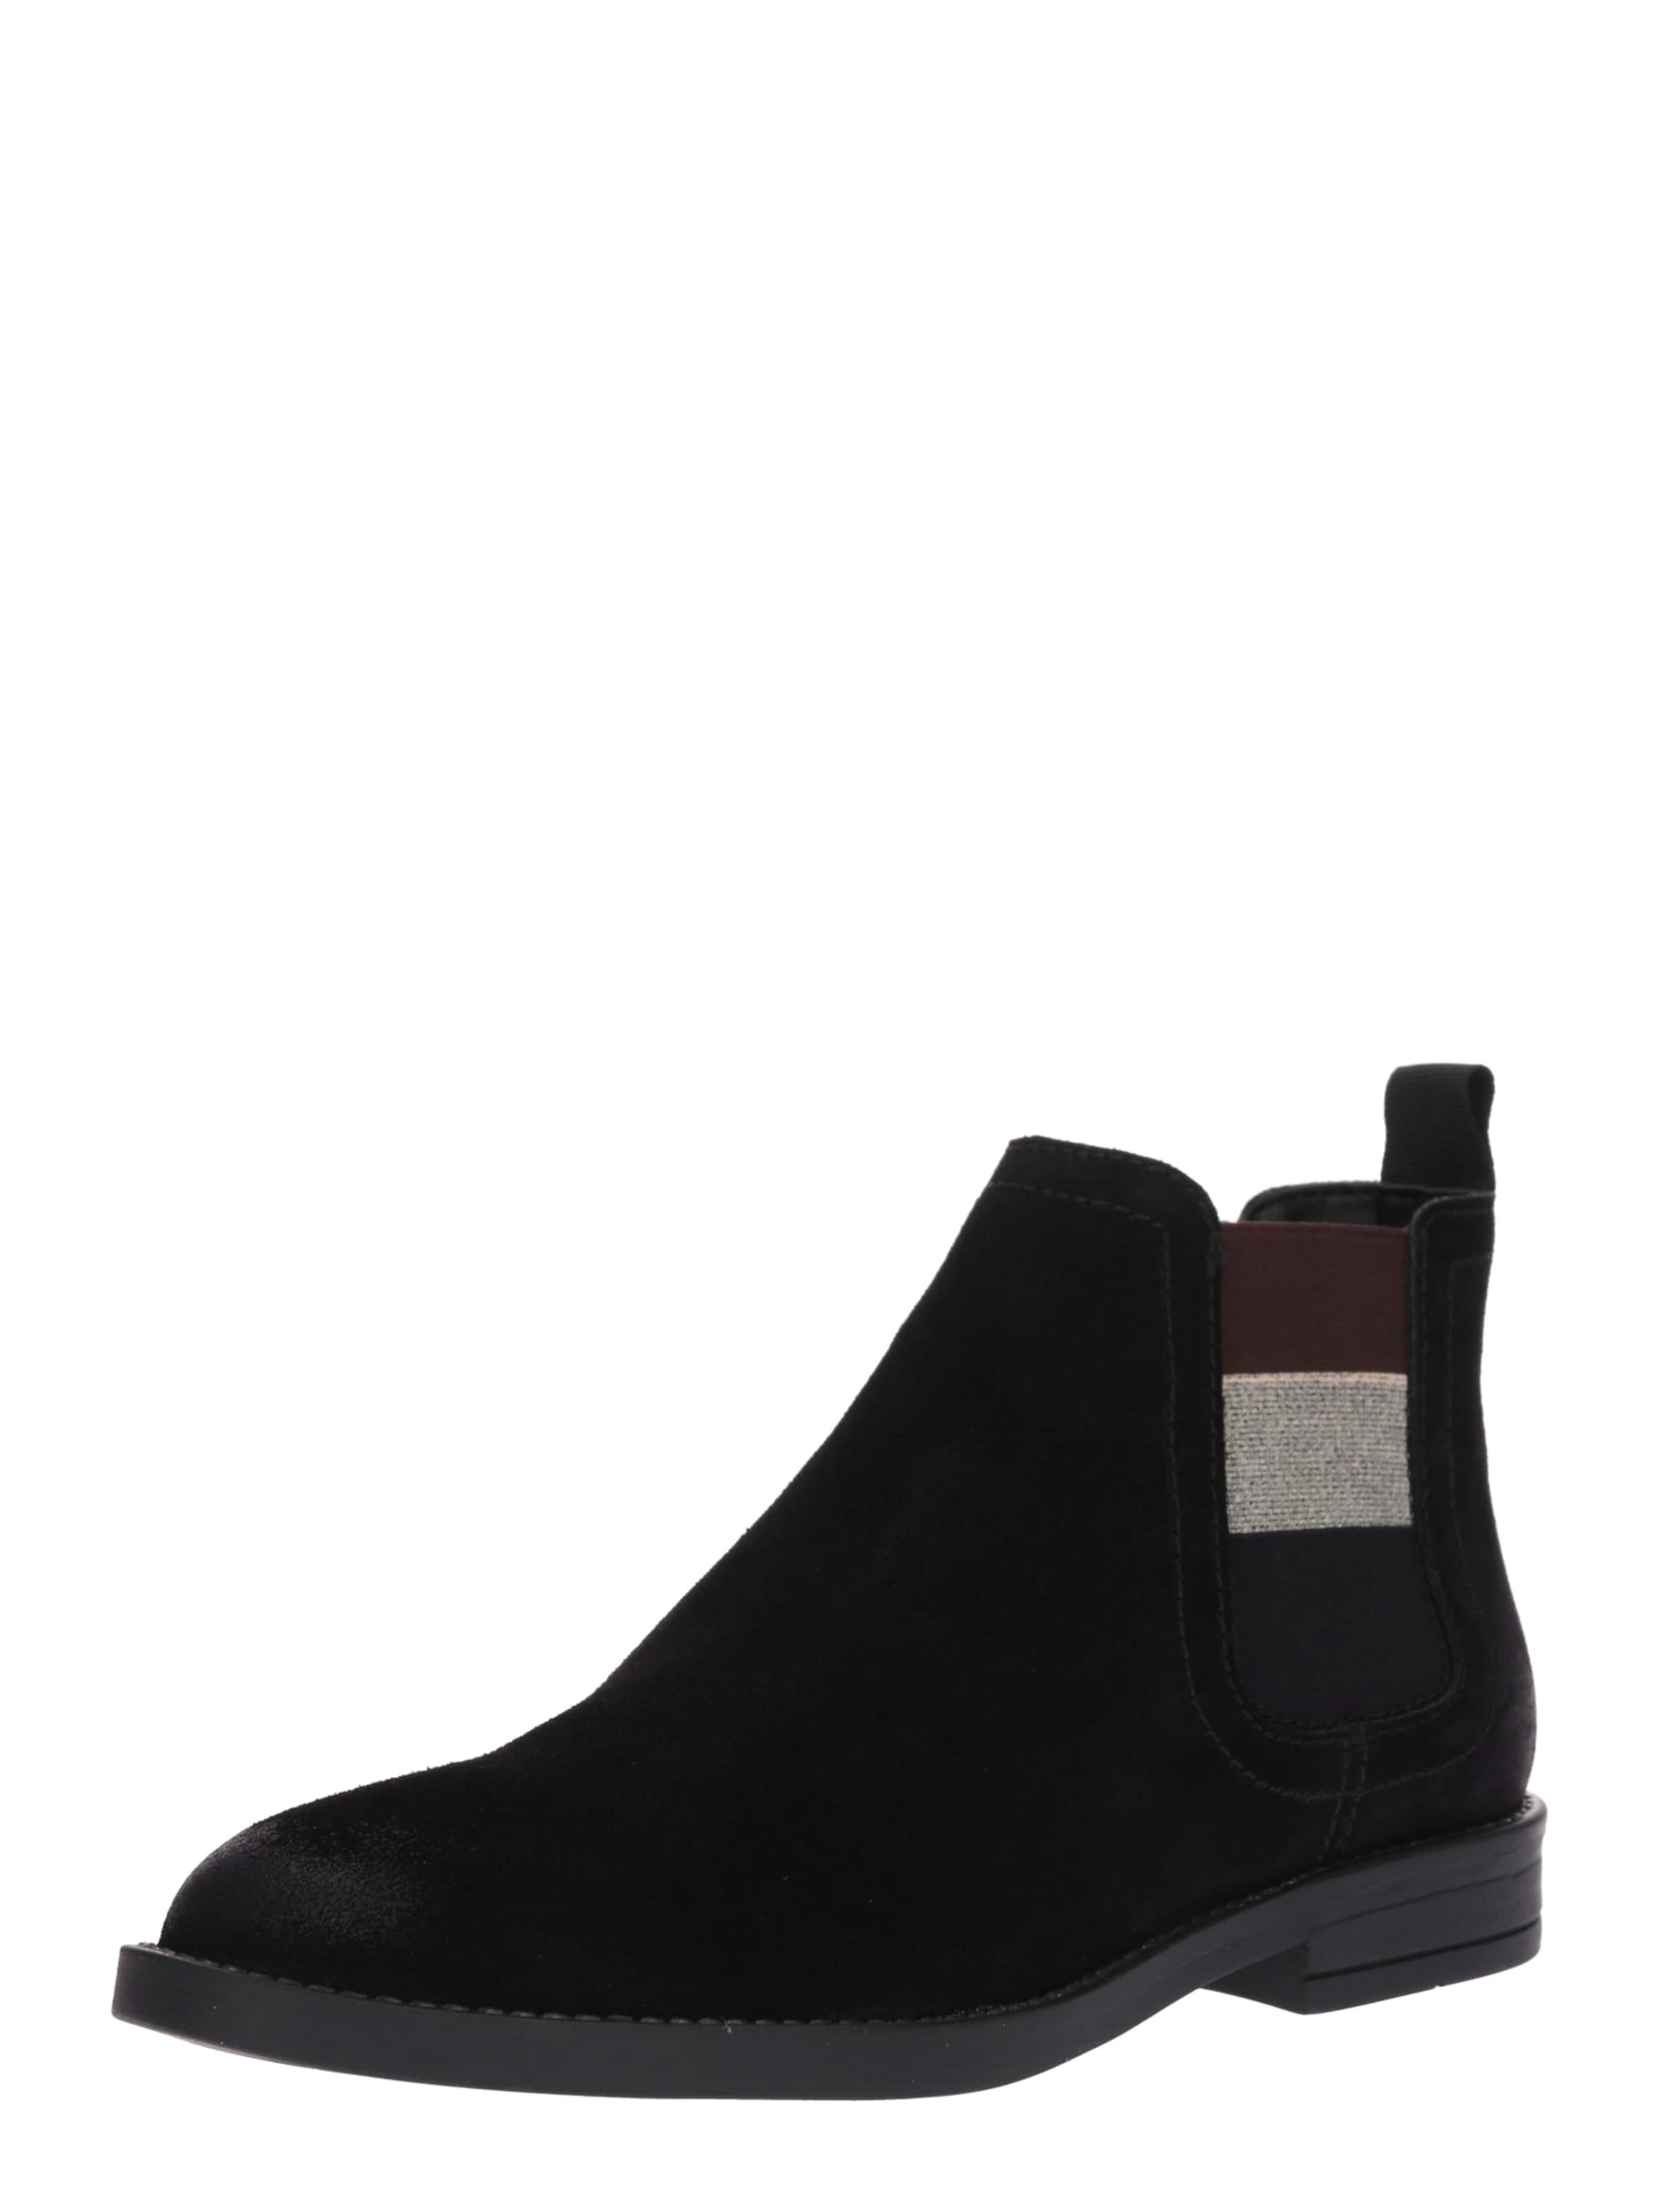 Tommy Jeans Chelsea-Boot ESSENTIAL Verschleißfeste billige Schuhe